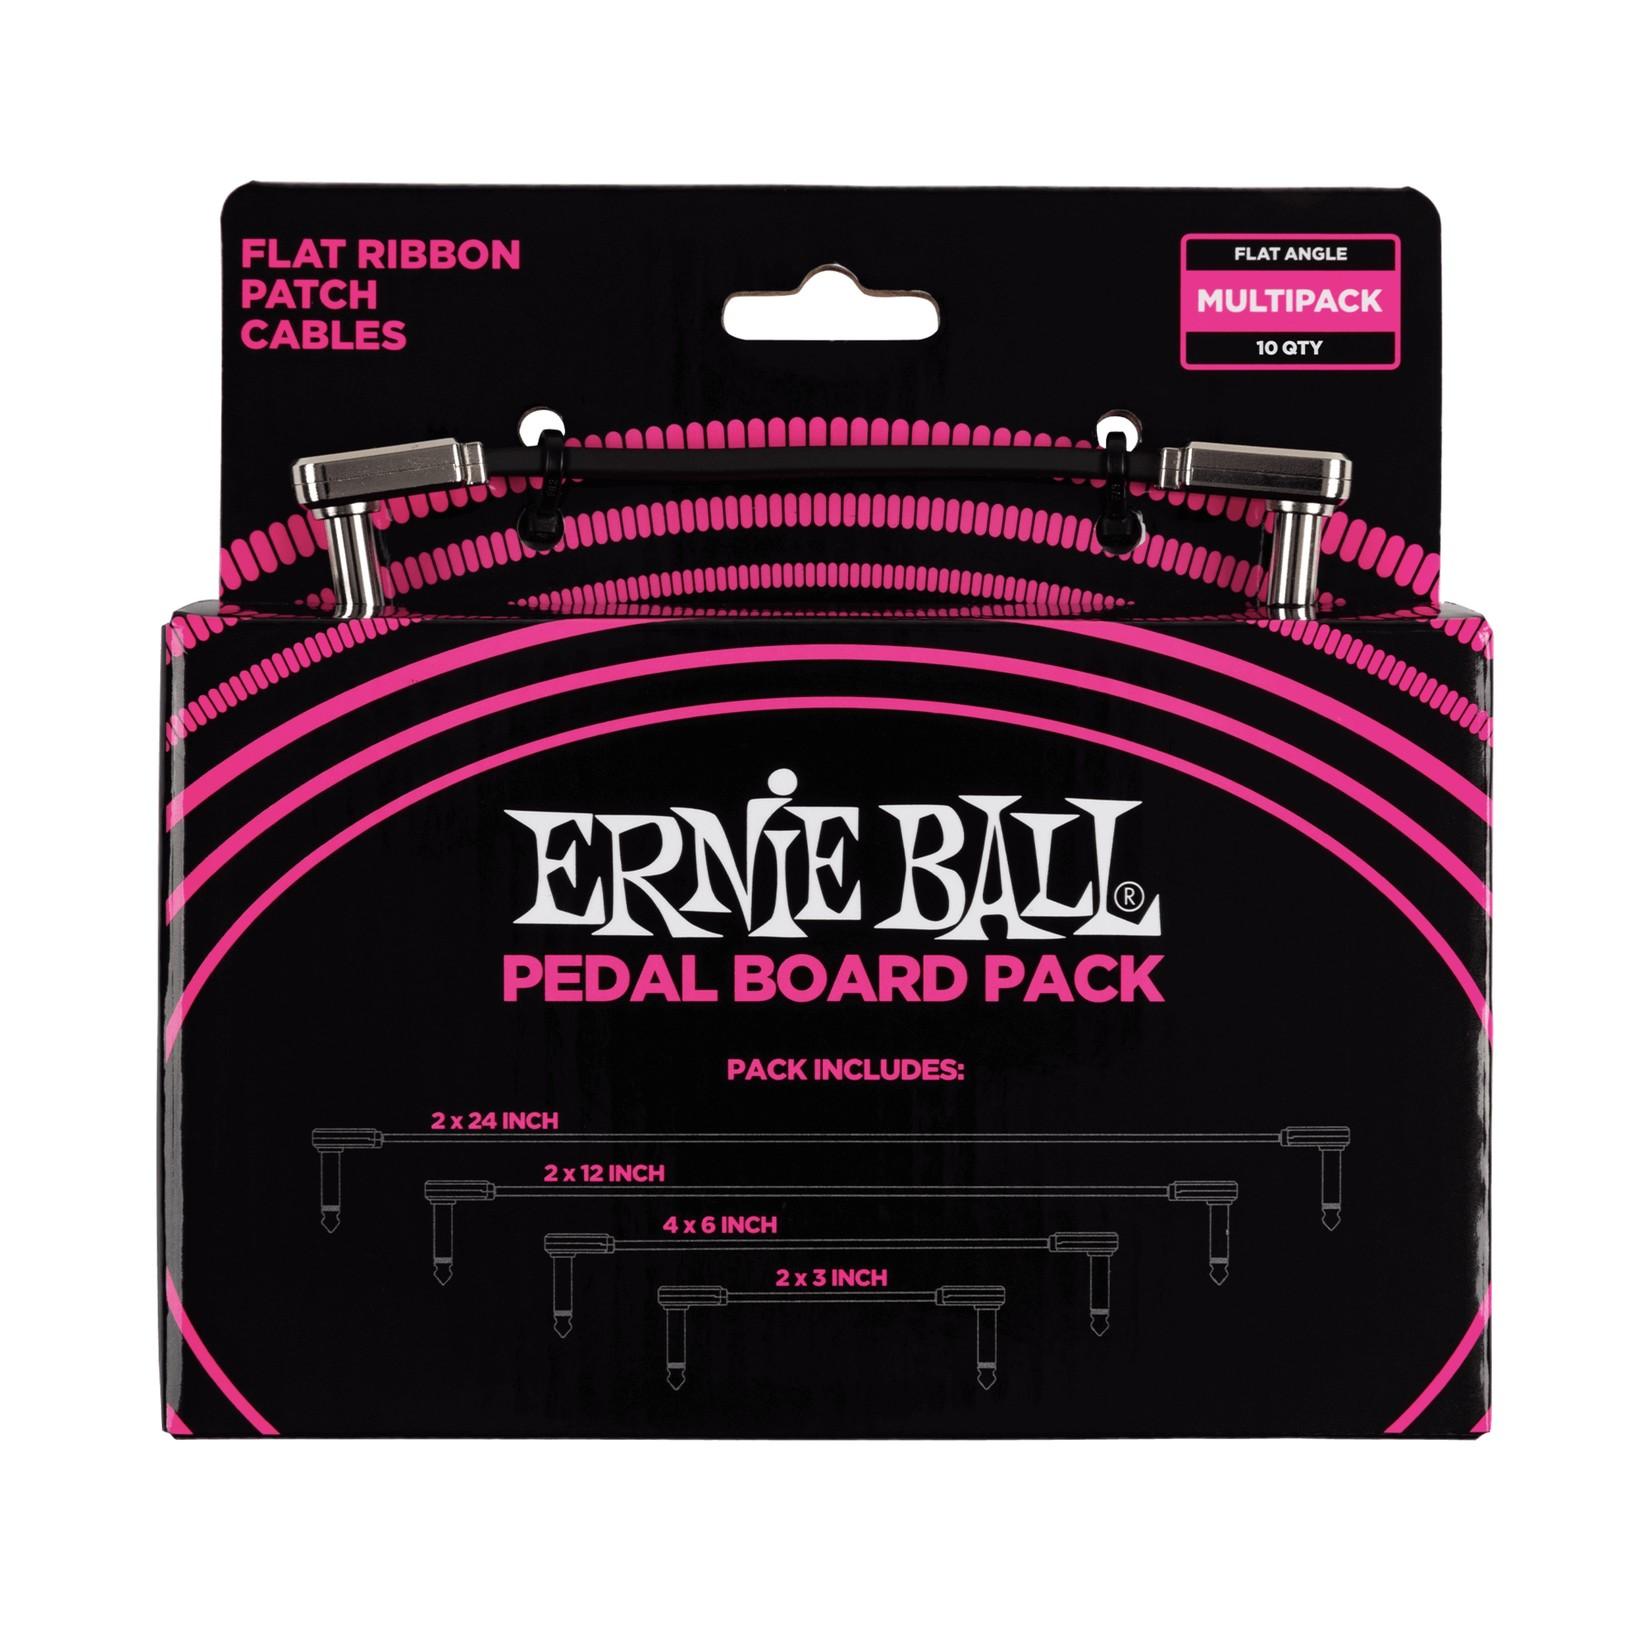 "Ernie Ball Ernie Ball Flat Ribbon Patch Cables Pedalboard Multi-Pack (2x 24"" 2x 12""   4x 6""   2x 3"")"